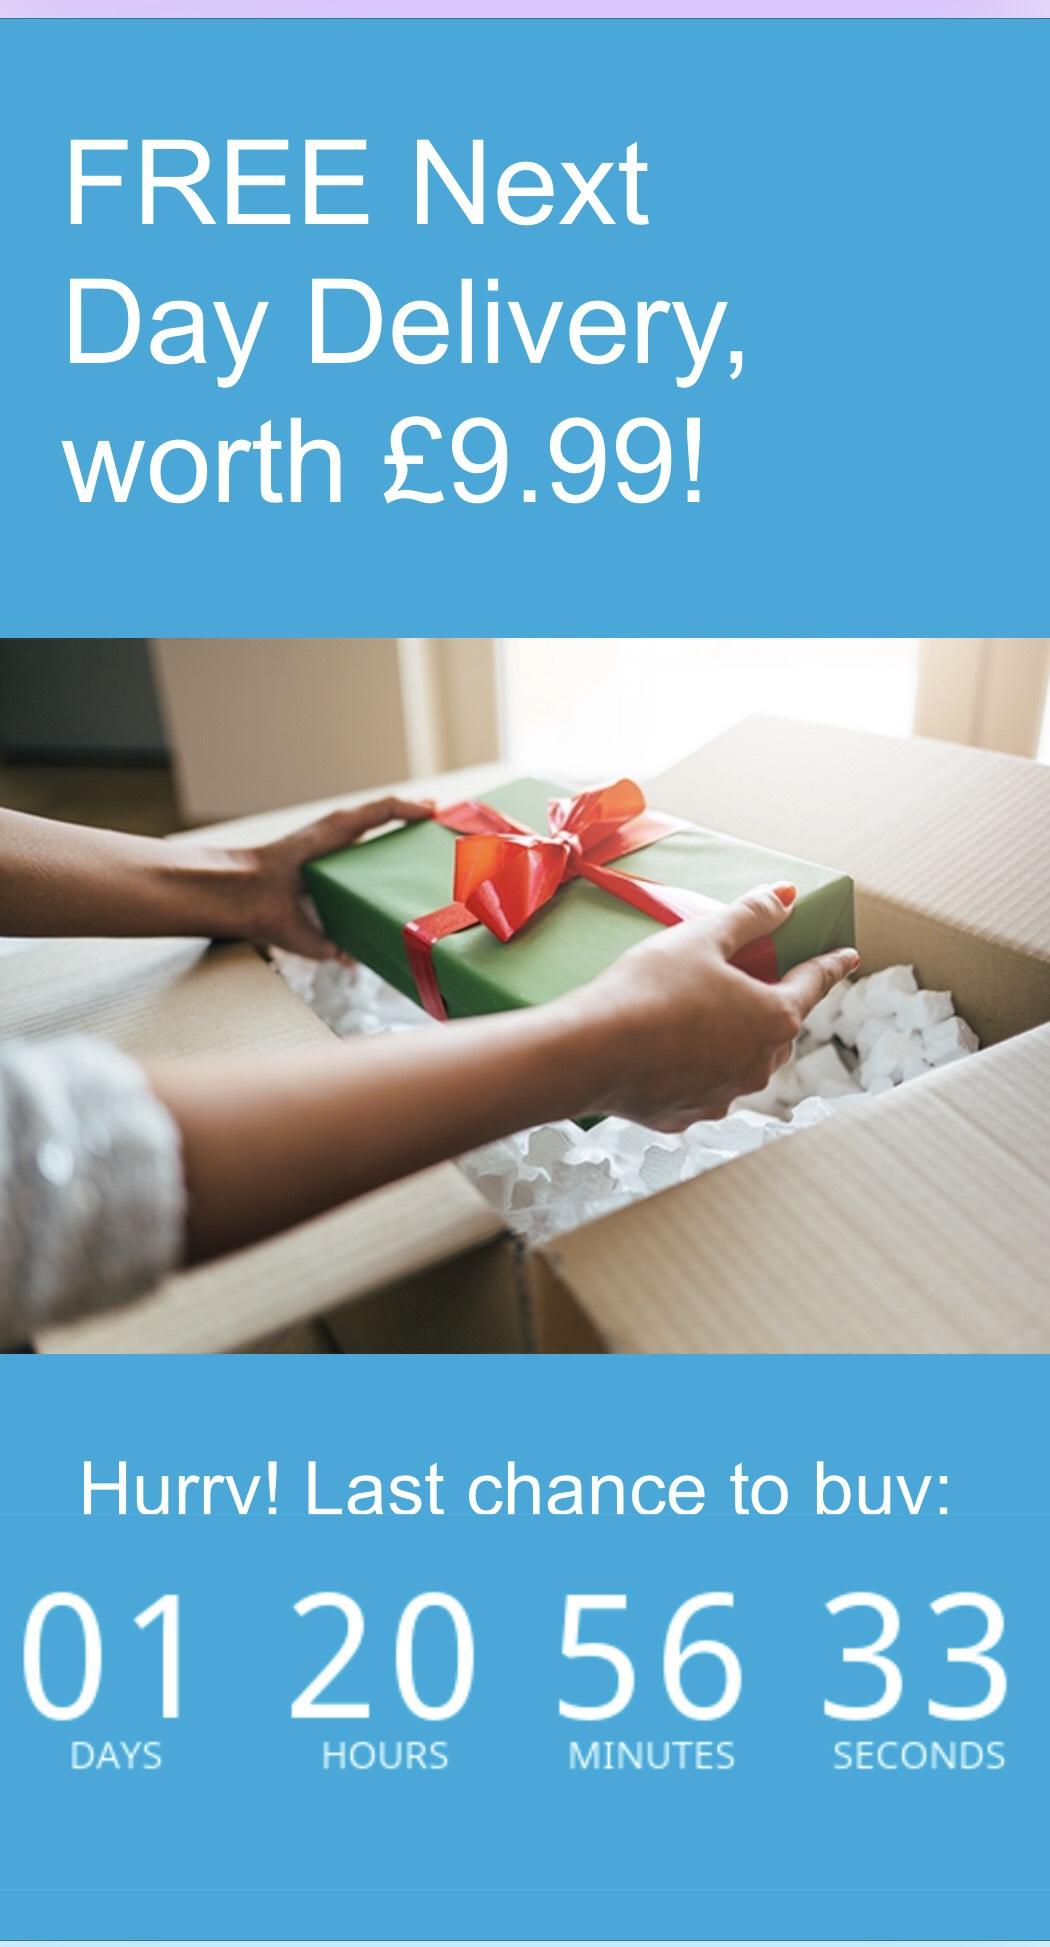 BT Shop Free Next Day Delivery (worth £9.99) - No Minimum Spend